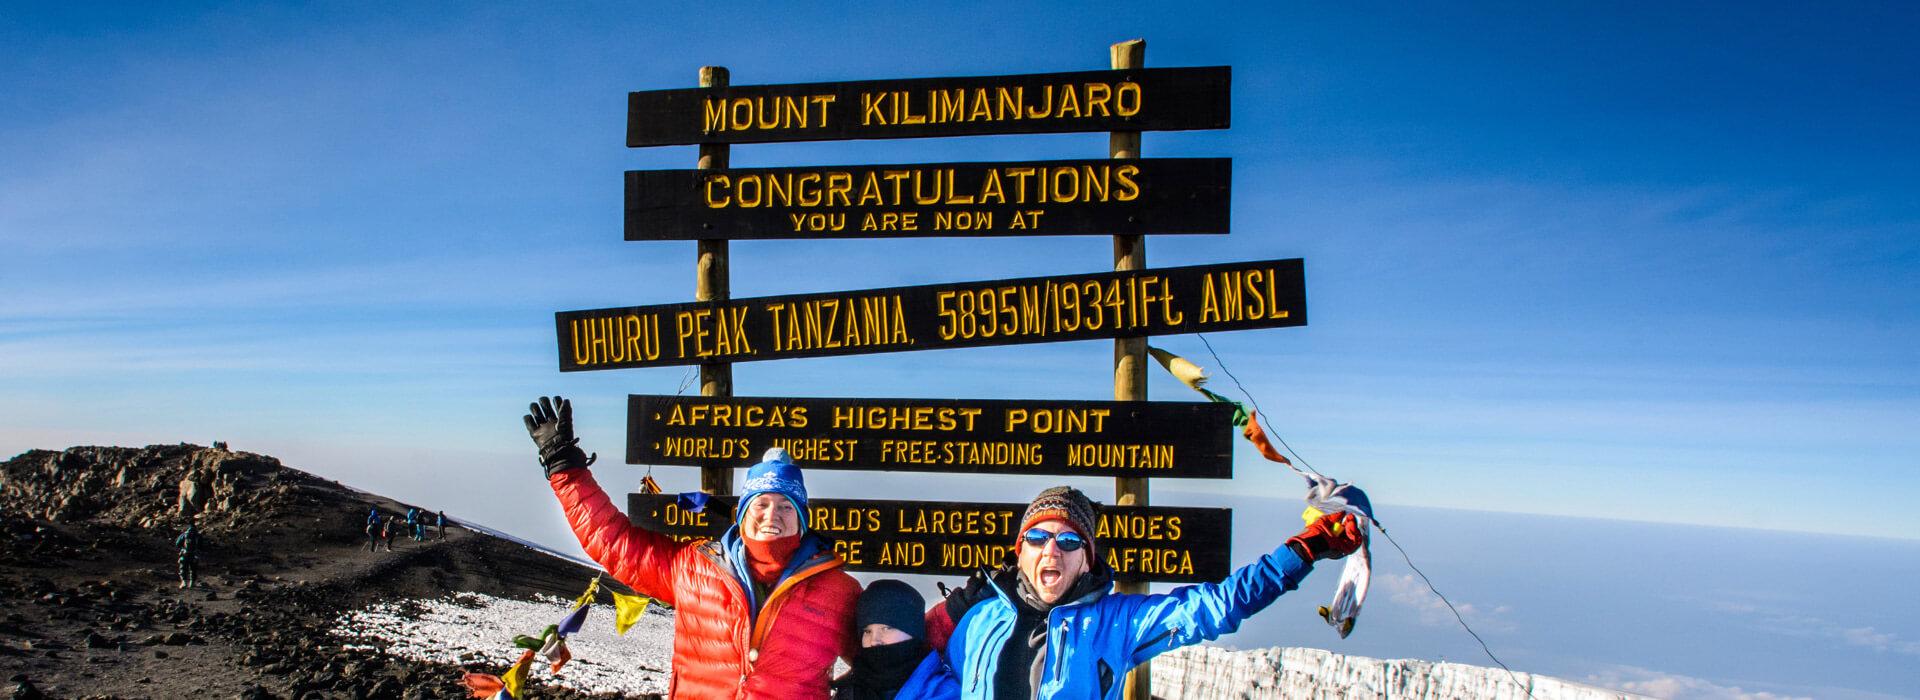 Kilimanjaro Insurance